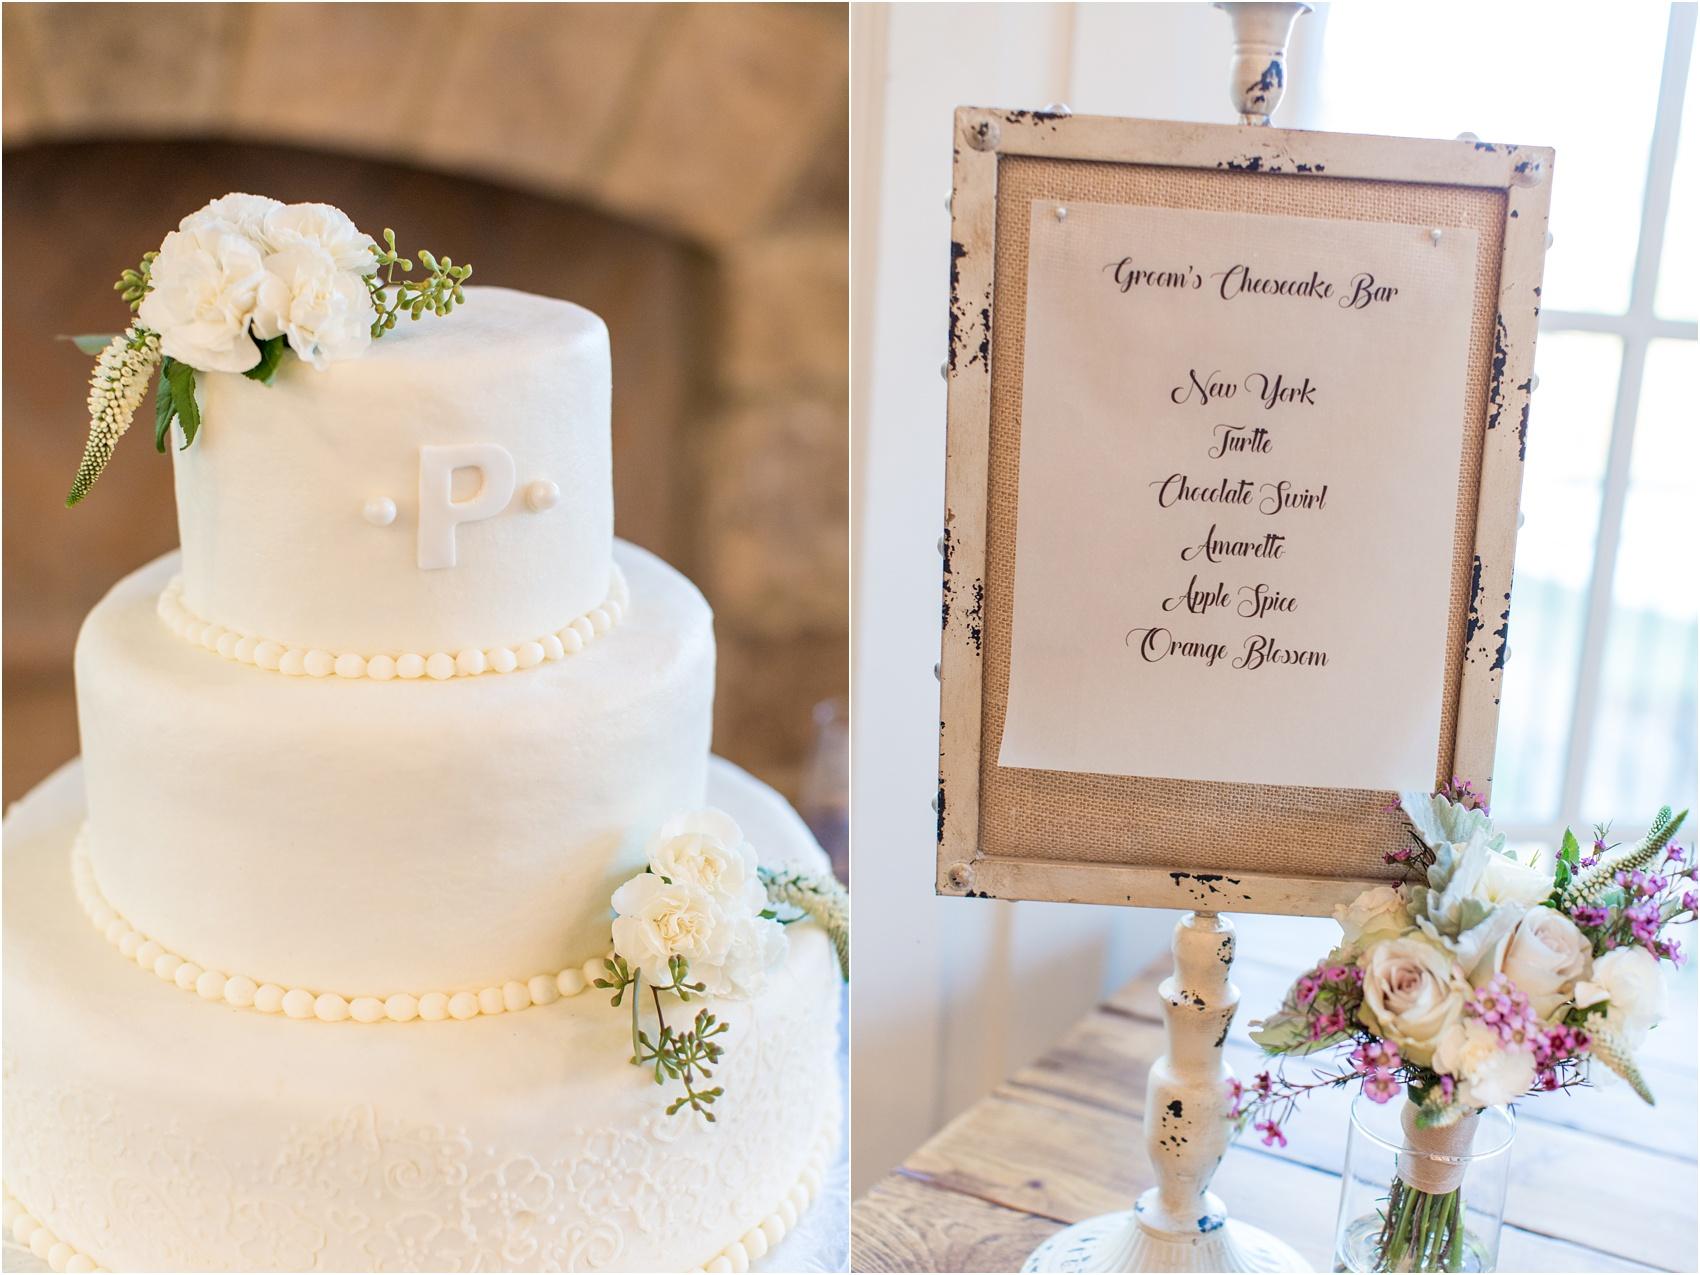 Savannah Eve Photography- Perkins Wedding- Blog-34.jpg